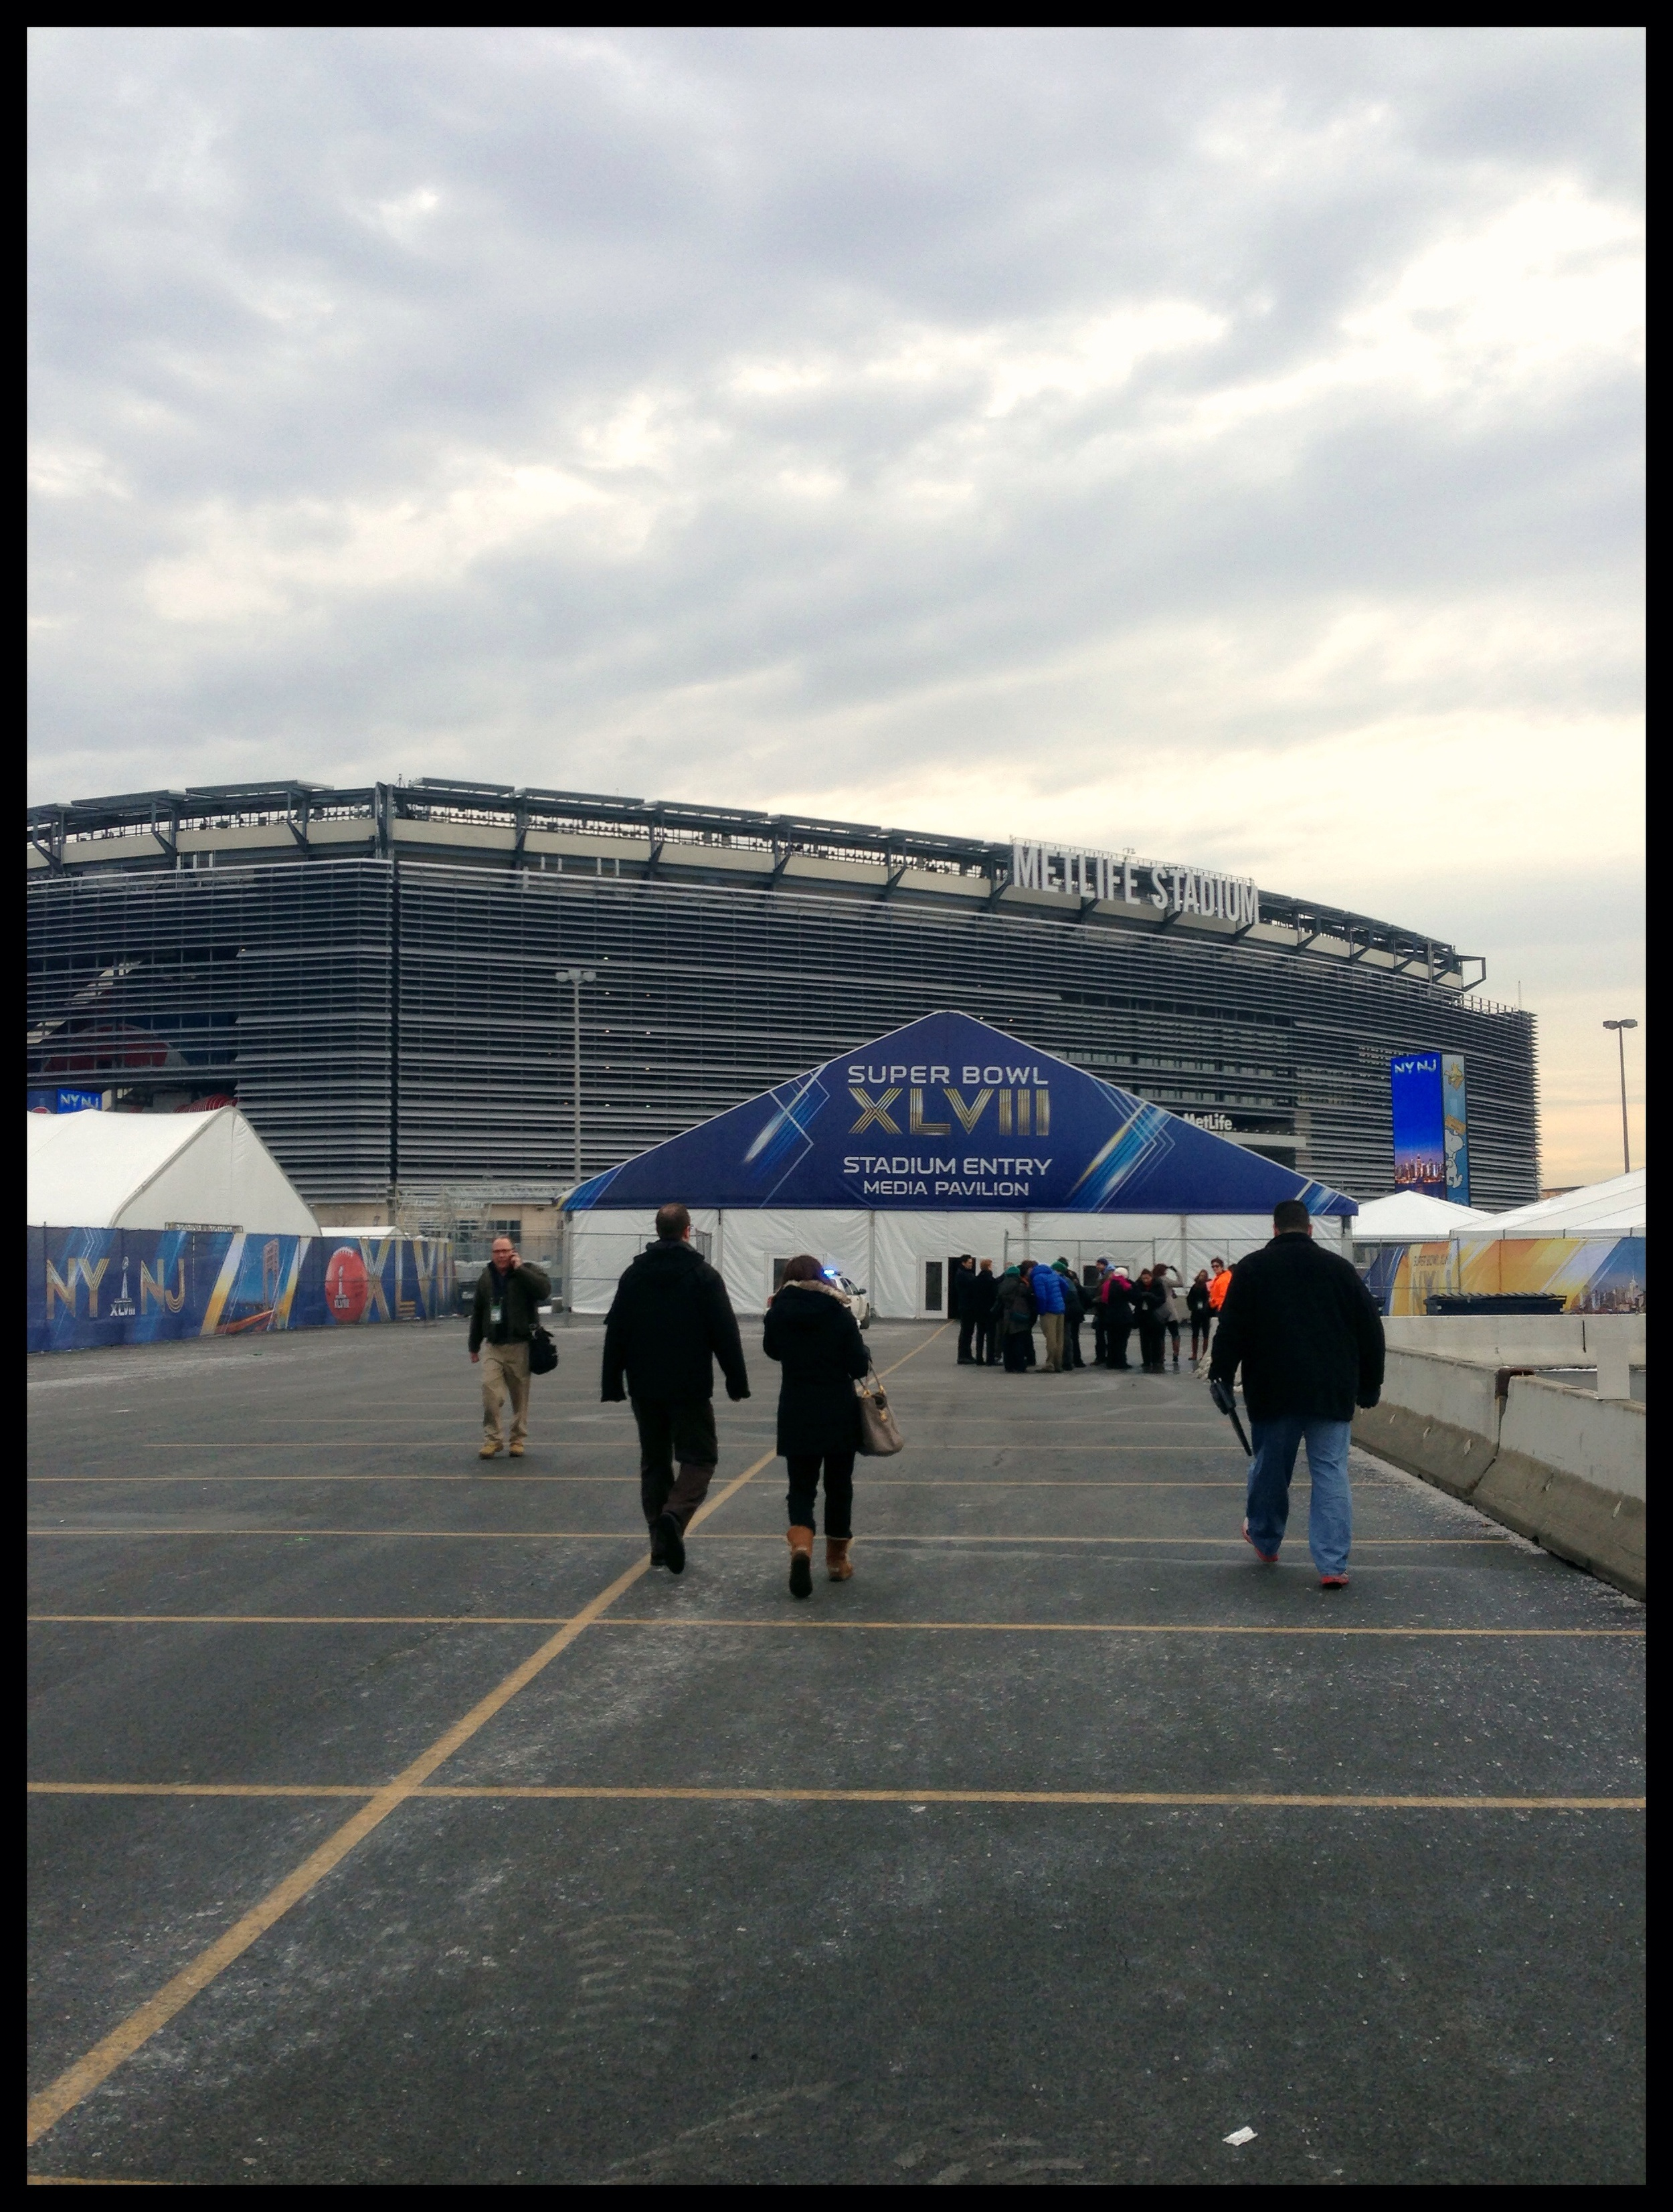 Preparations at Met life Stadium for the Big Game